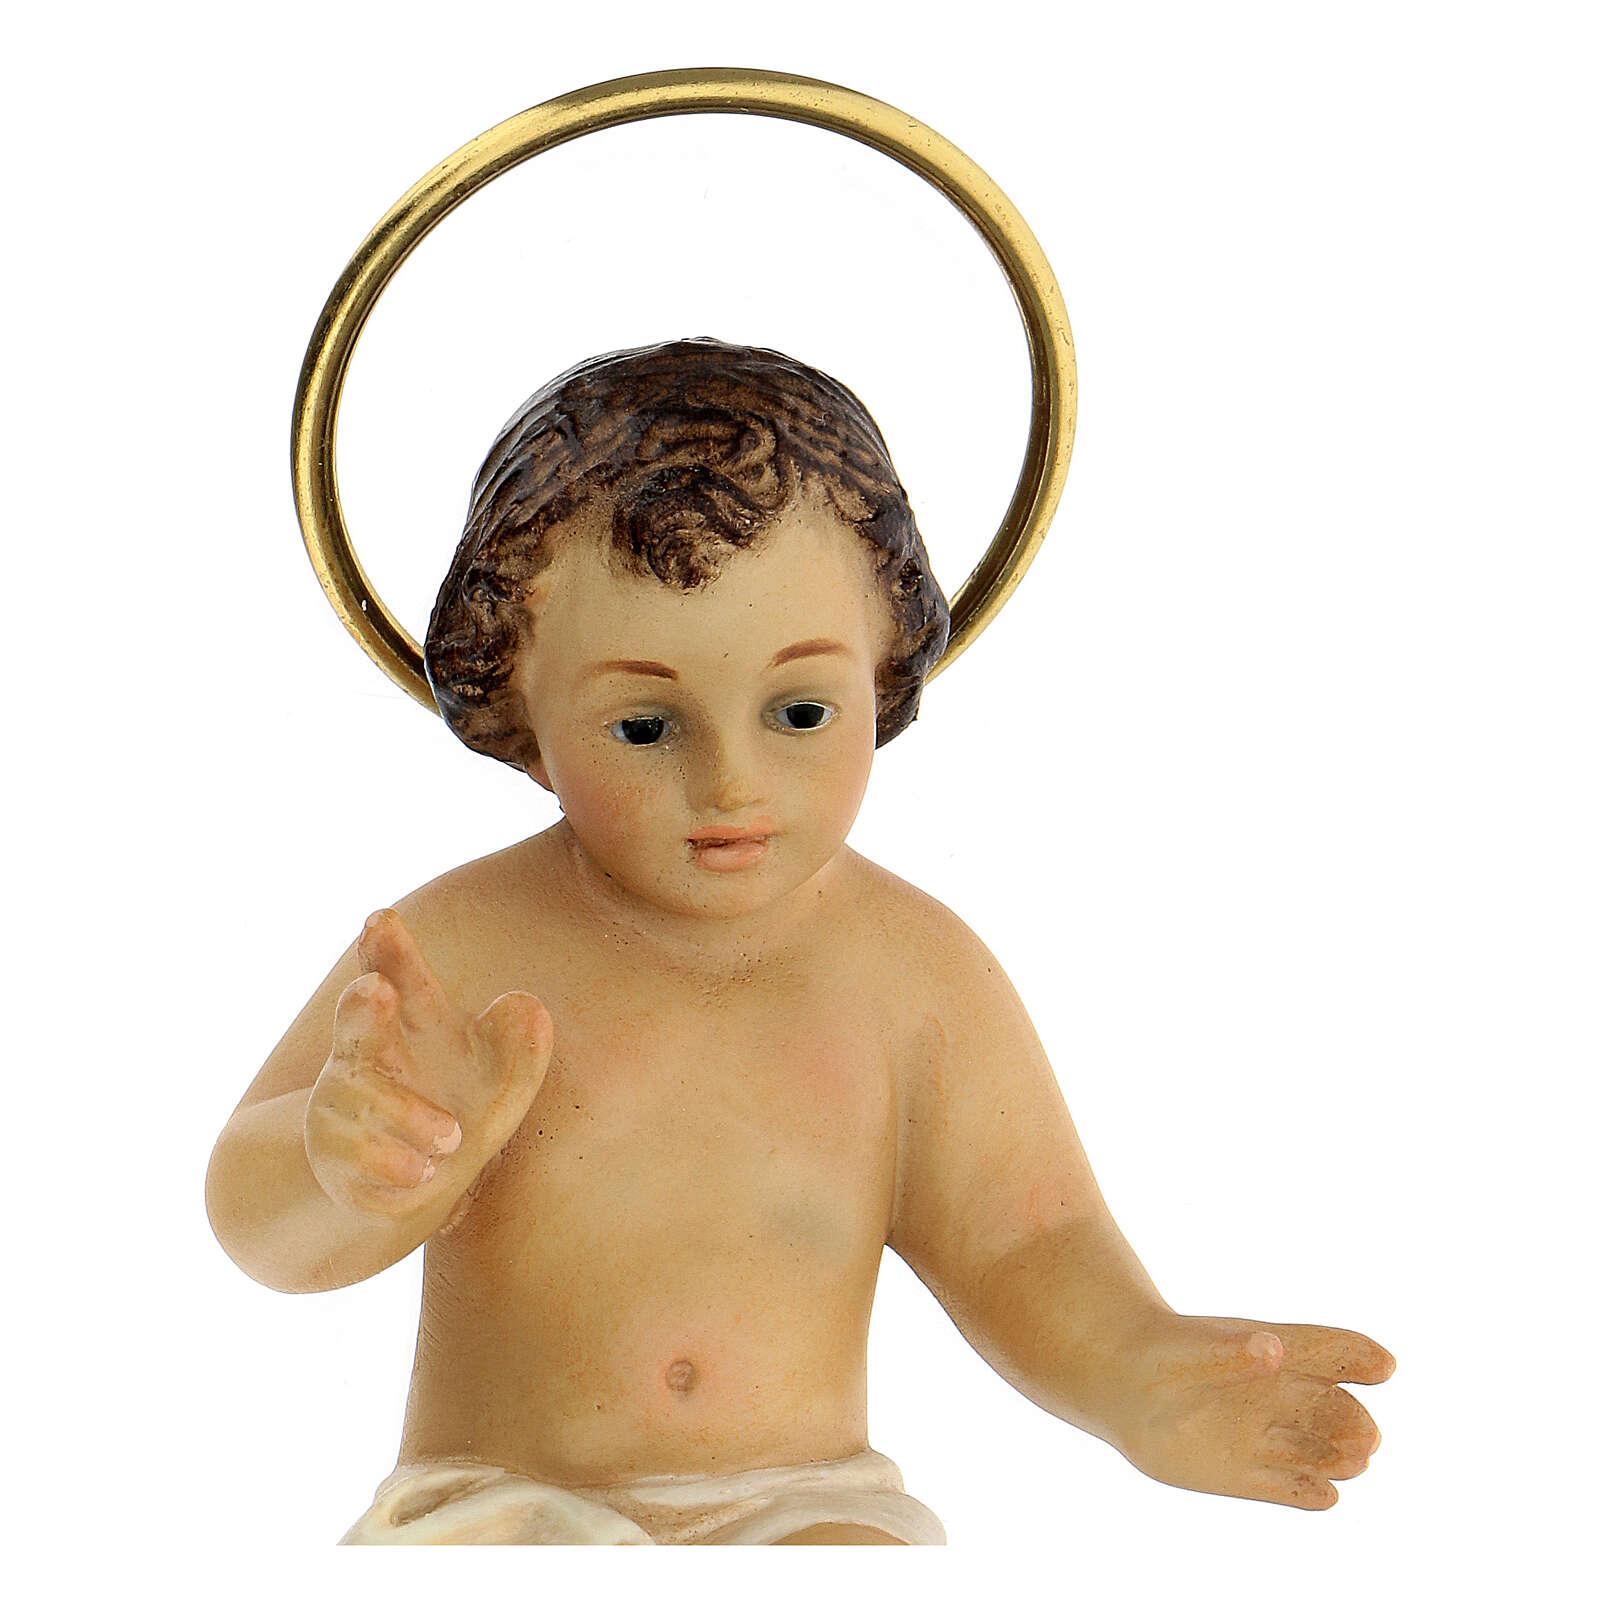 STOCK Gesù Bambino legno benedicente veste bianca 10 cm dec. Elegante 3